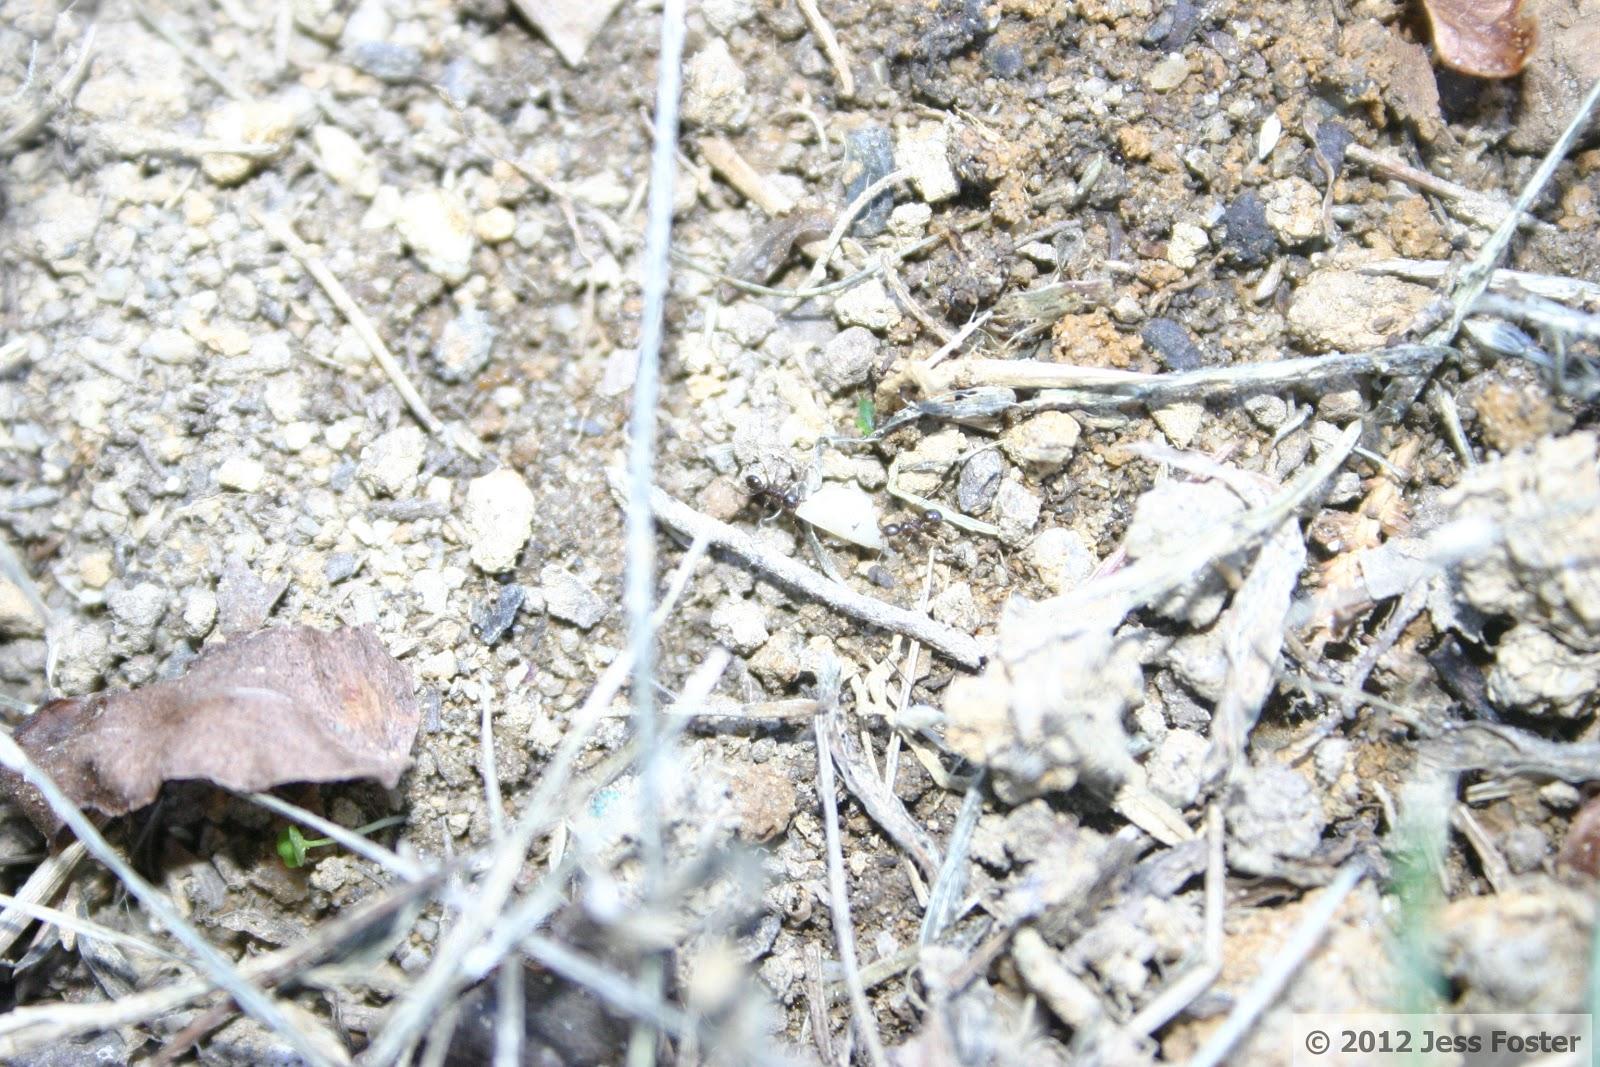 Sluggin' Along: To Be an Ant: The Treacherous Journey